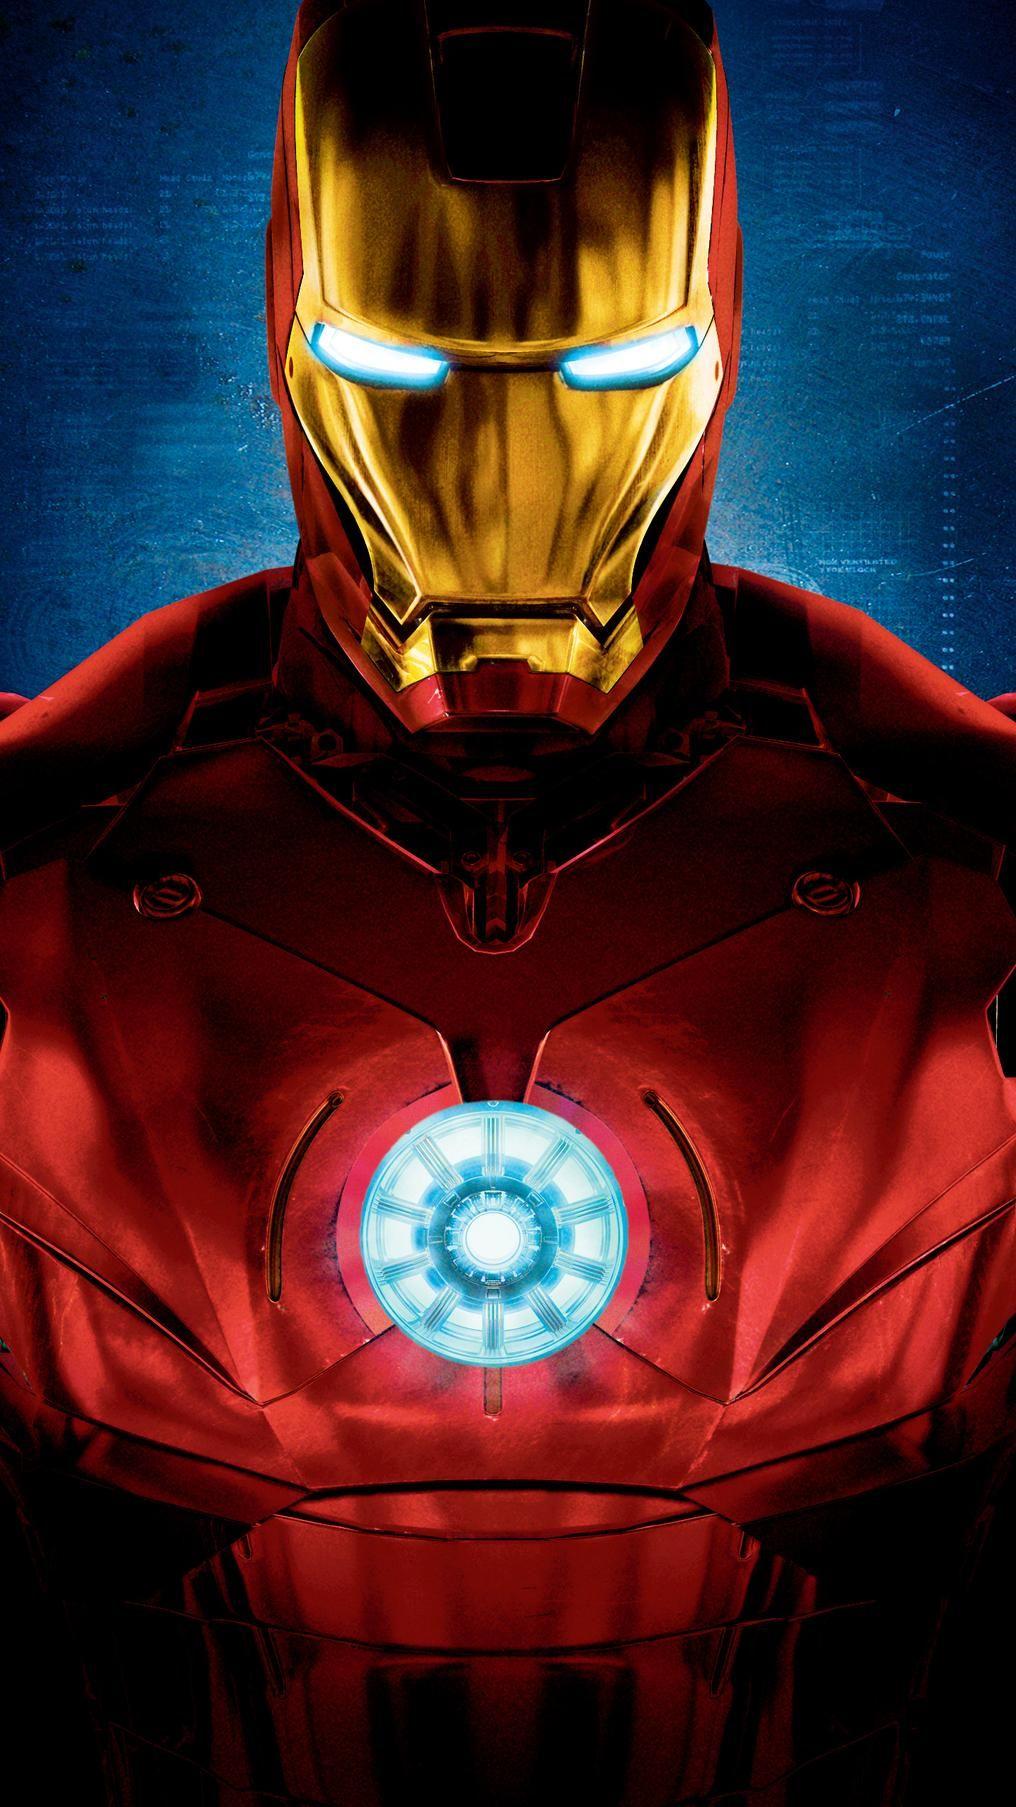 Iron Man 2008 Phone Wallpaper Moviemania Iron Man Hd Wallpaper Iron Man Wallpaper Iron Man Movie